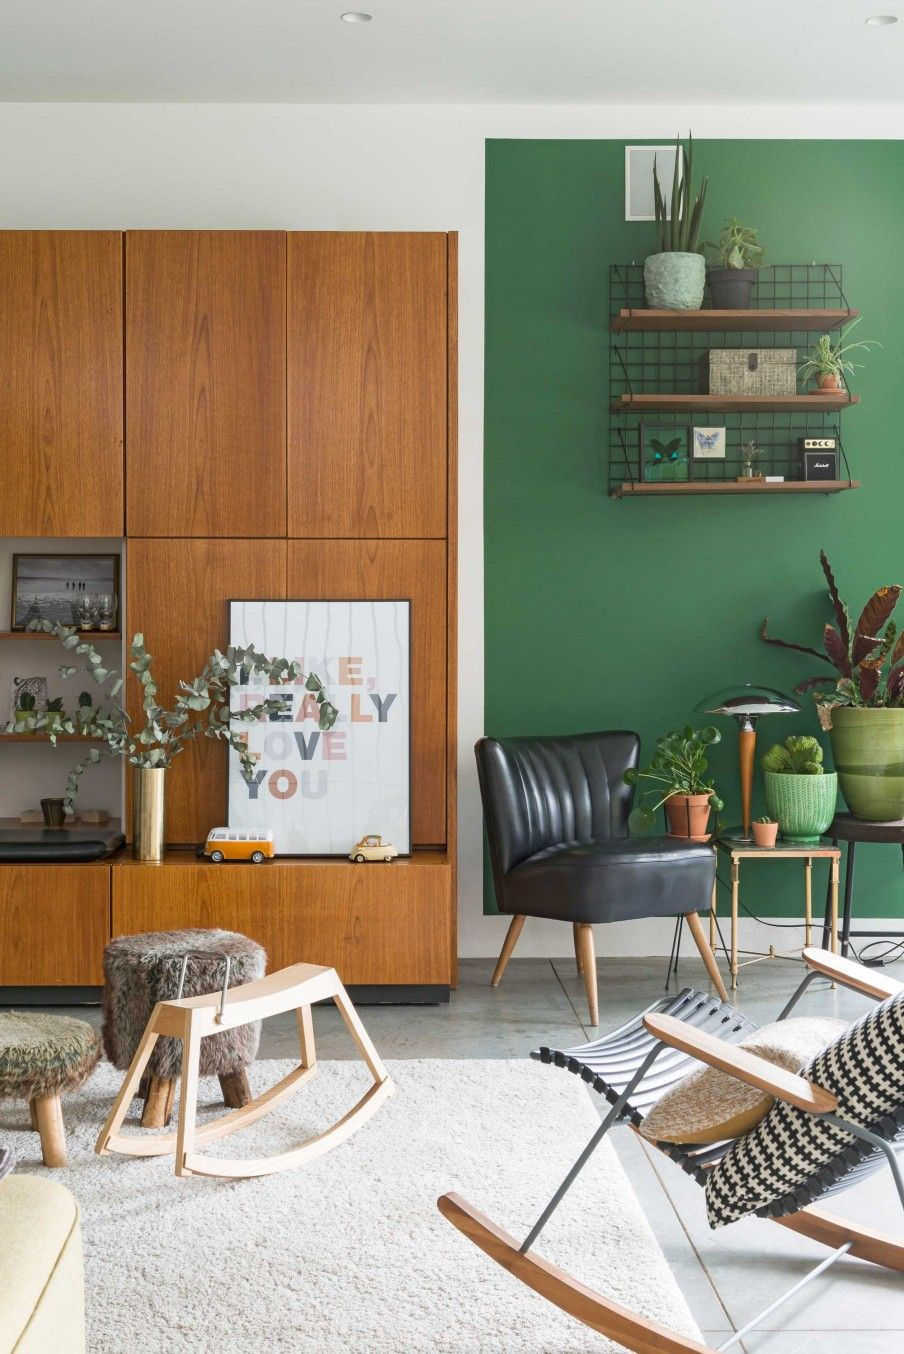 Woonkamer | living room | vtwonen 07-2017 | Styling & Fotografie ...